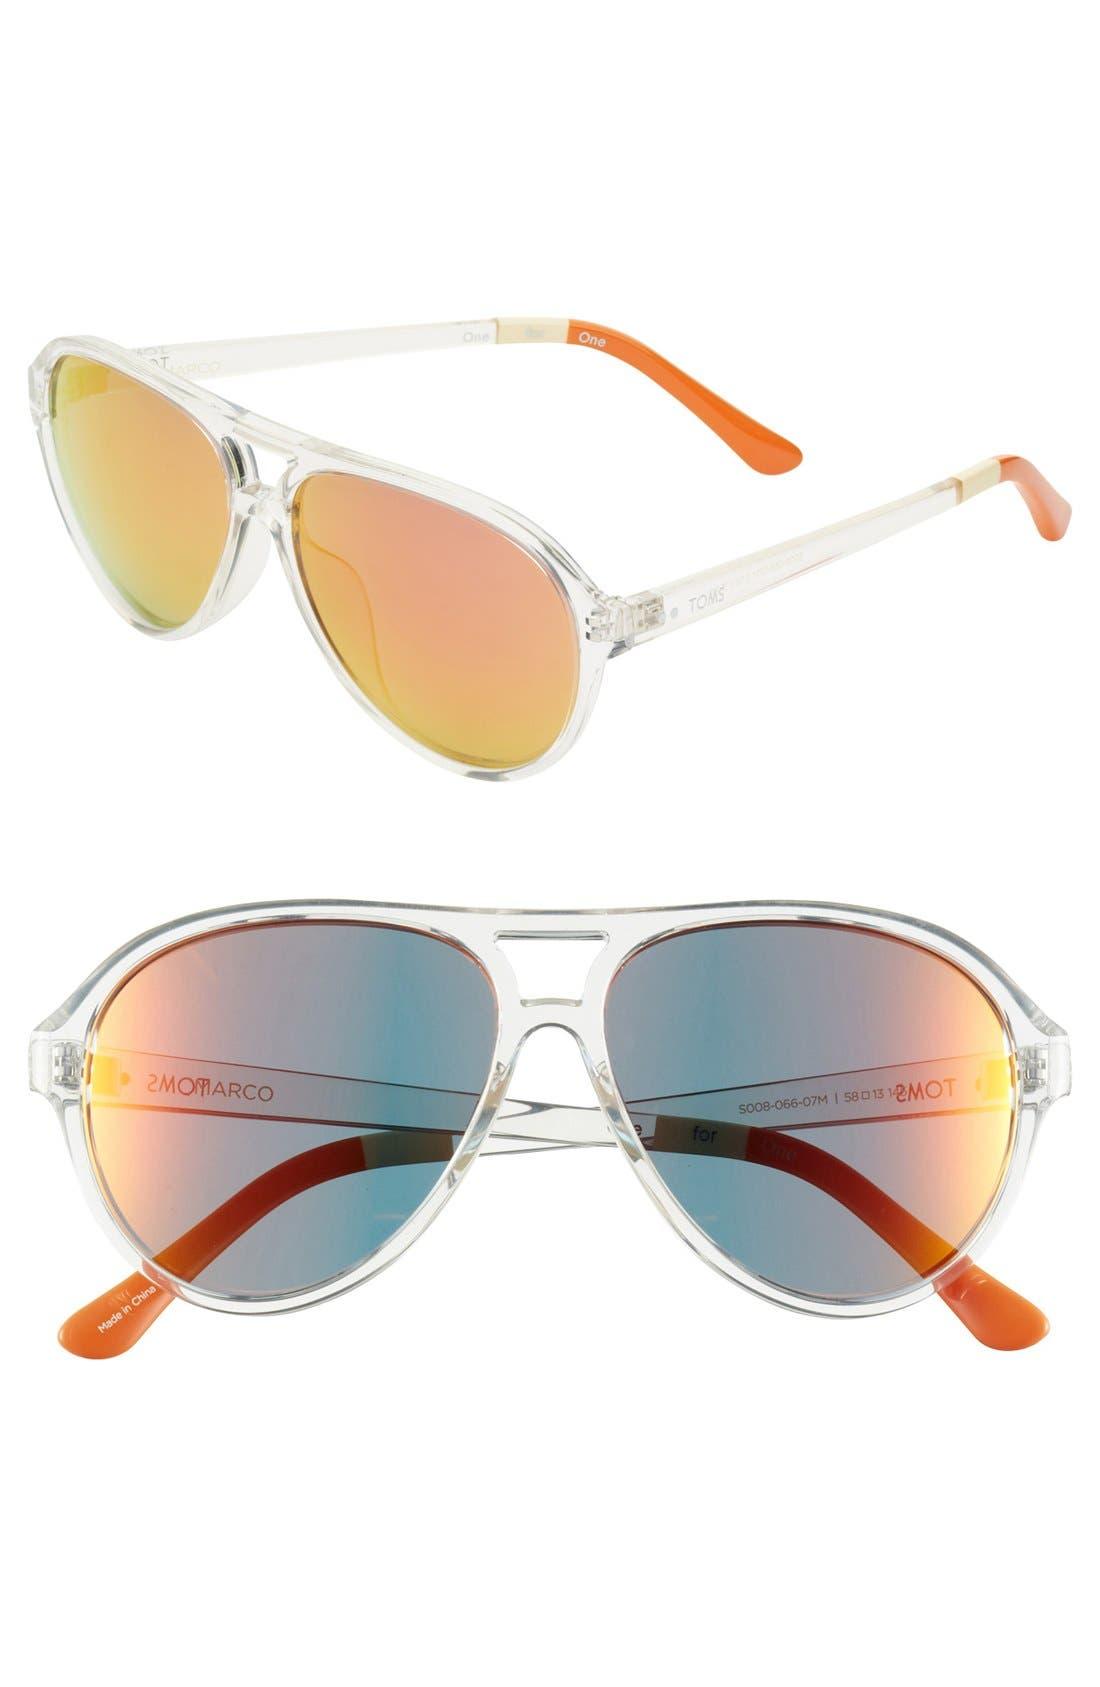 Main Image - TOMS 'Marco' 58mm Aviator Sunglasses